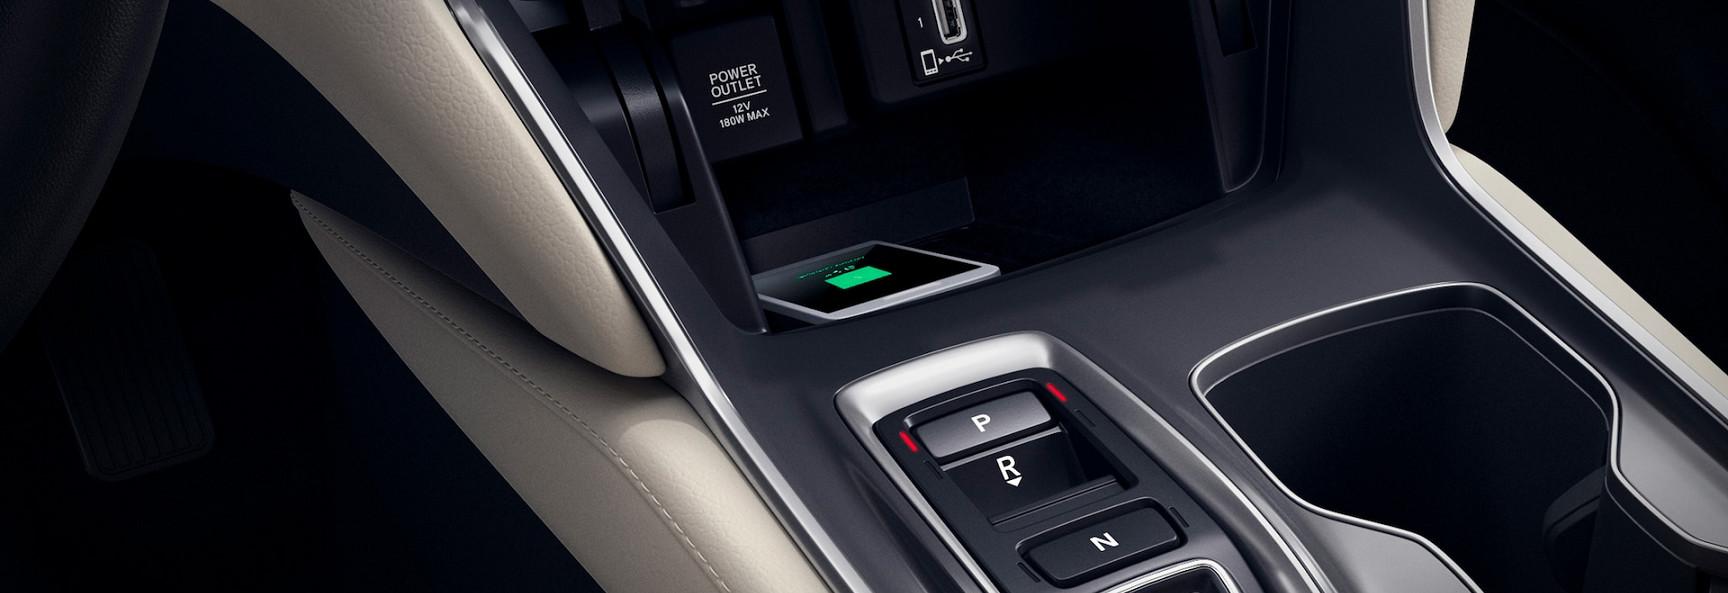 Modern Convenience in the 2020 Honda Accord